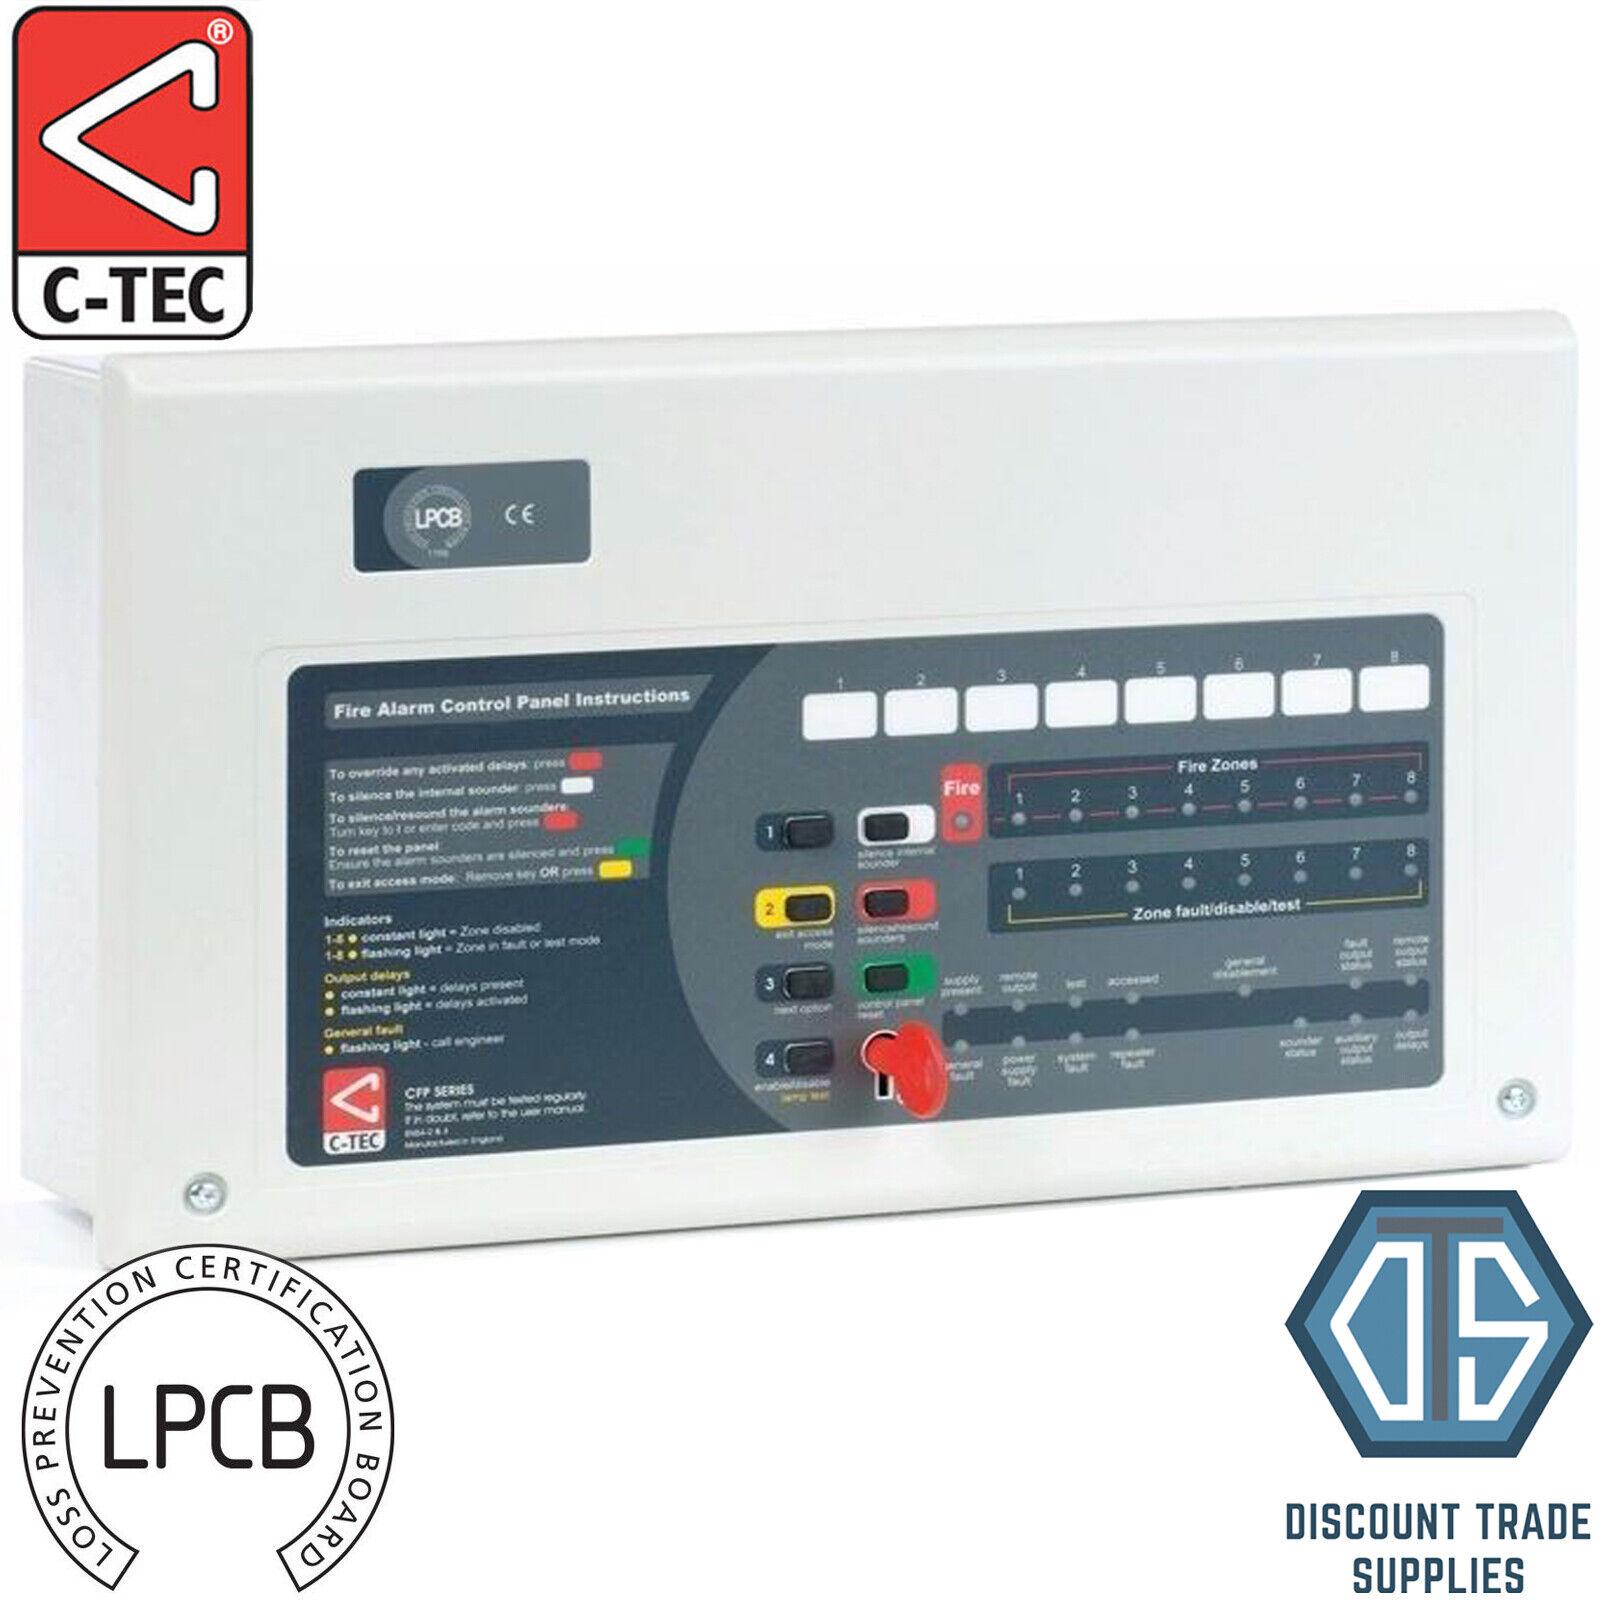 C-TEC PPC economía 8 zona convencional panel de alarma contra incendios CFP708E-4 CTEC CFP708E